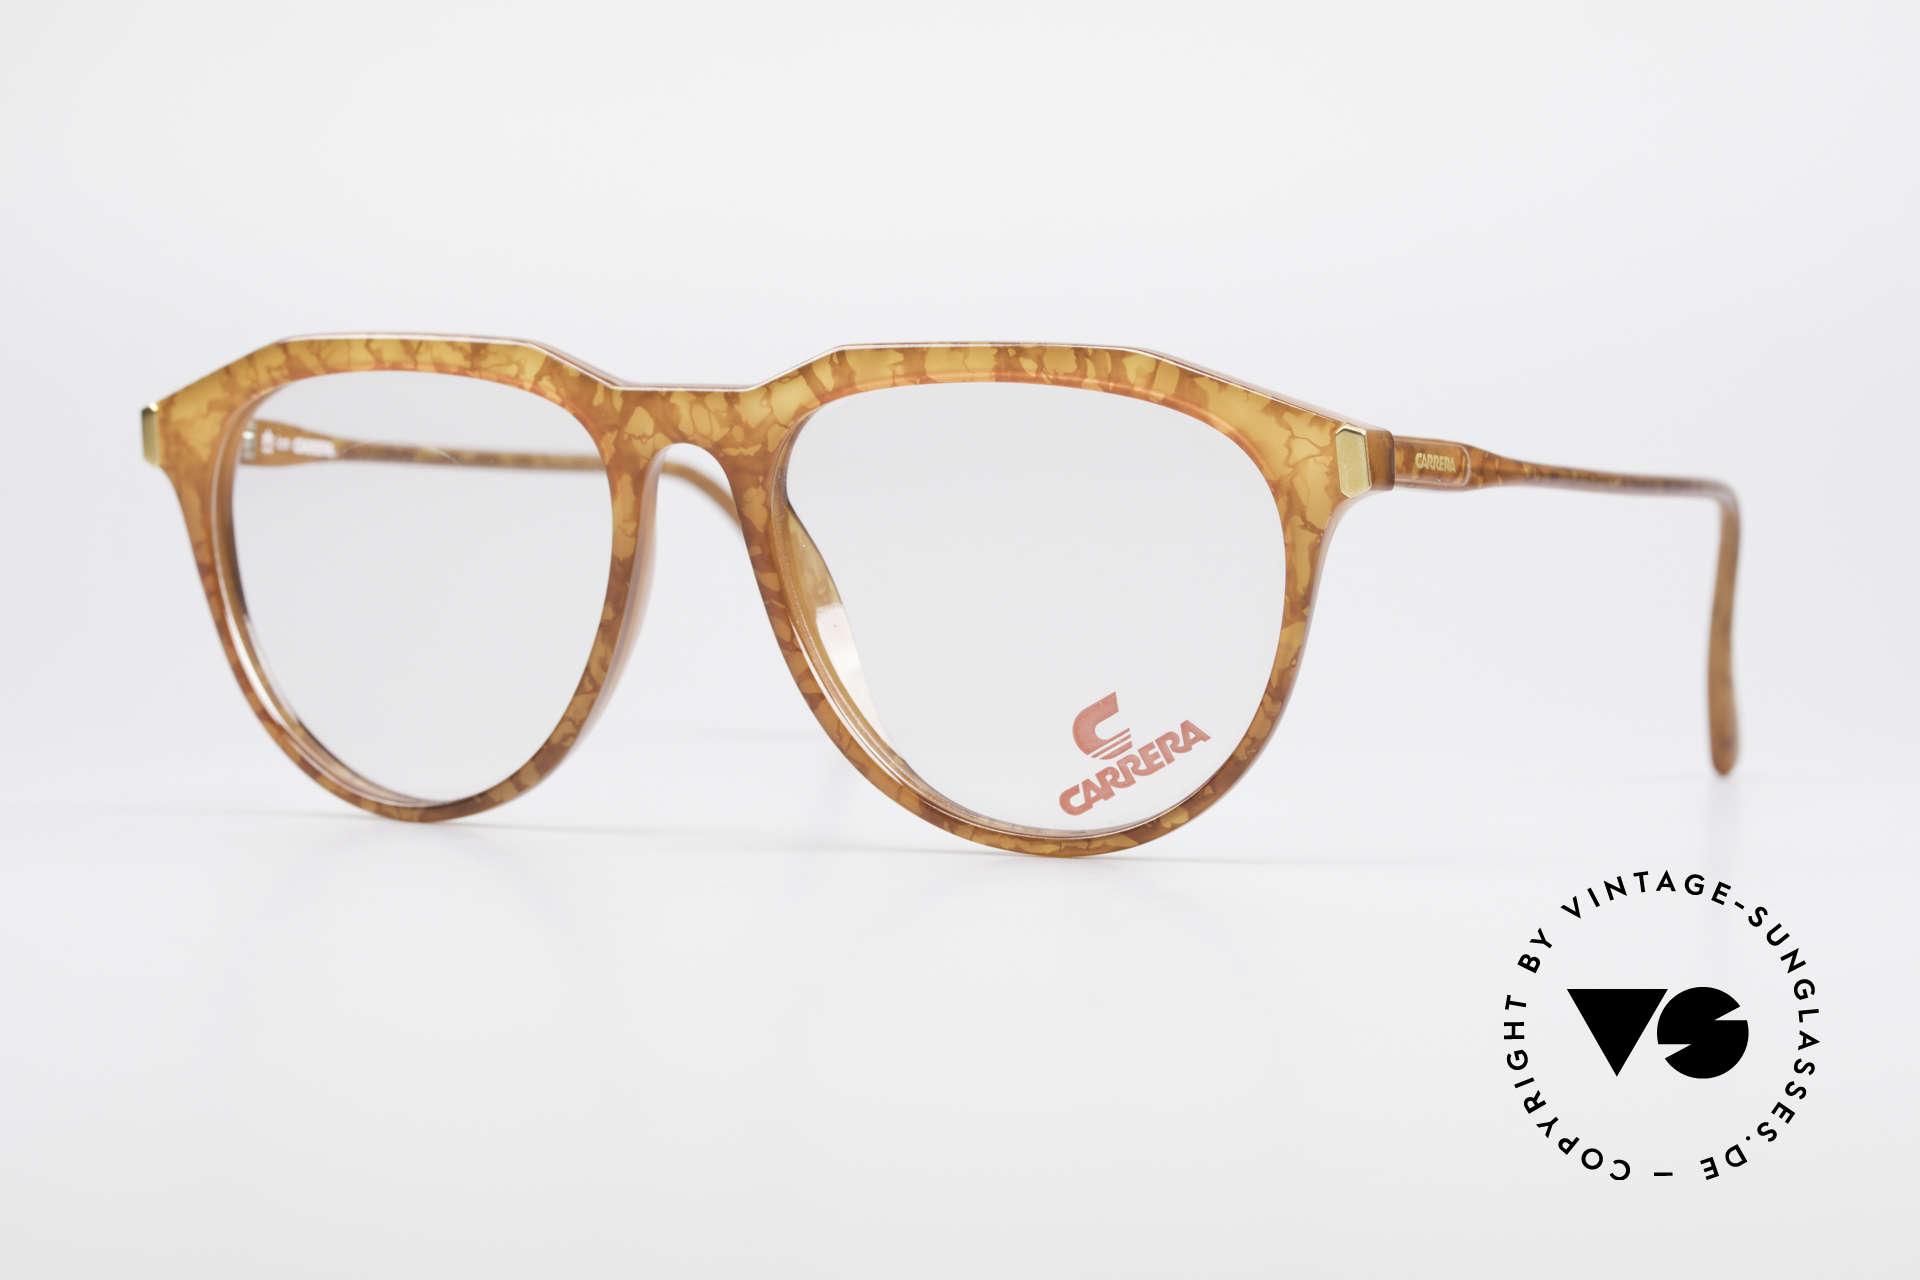 Carrera 5361 90's Panto Eyeglasses Optyl, vintage CARRERA panto eyeglasses from the 90's, Made for Men